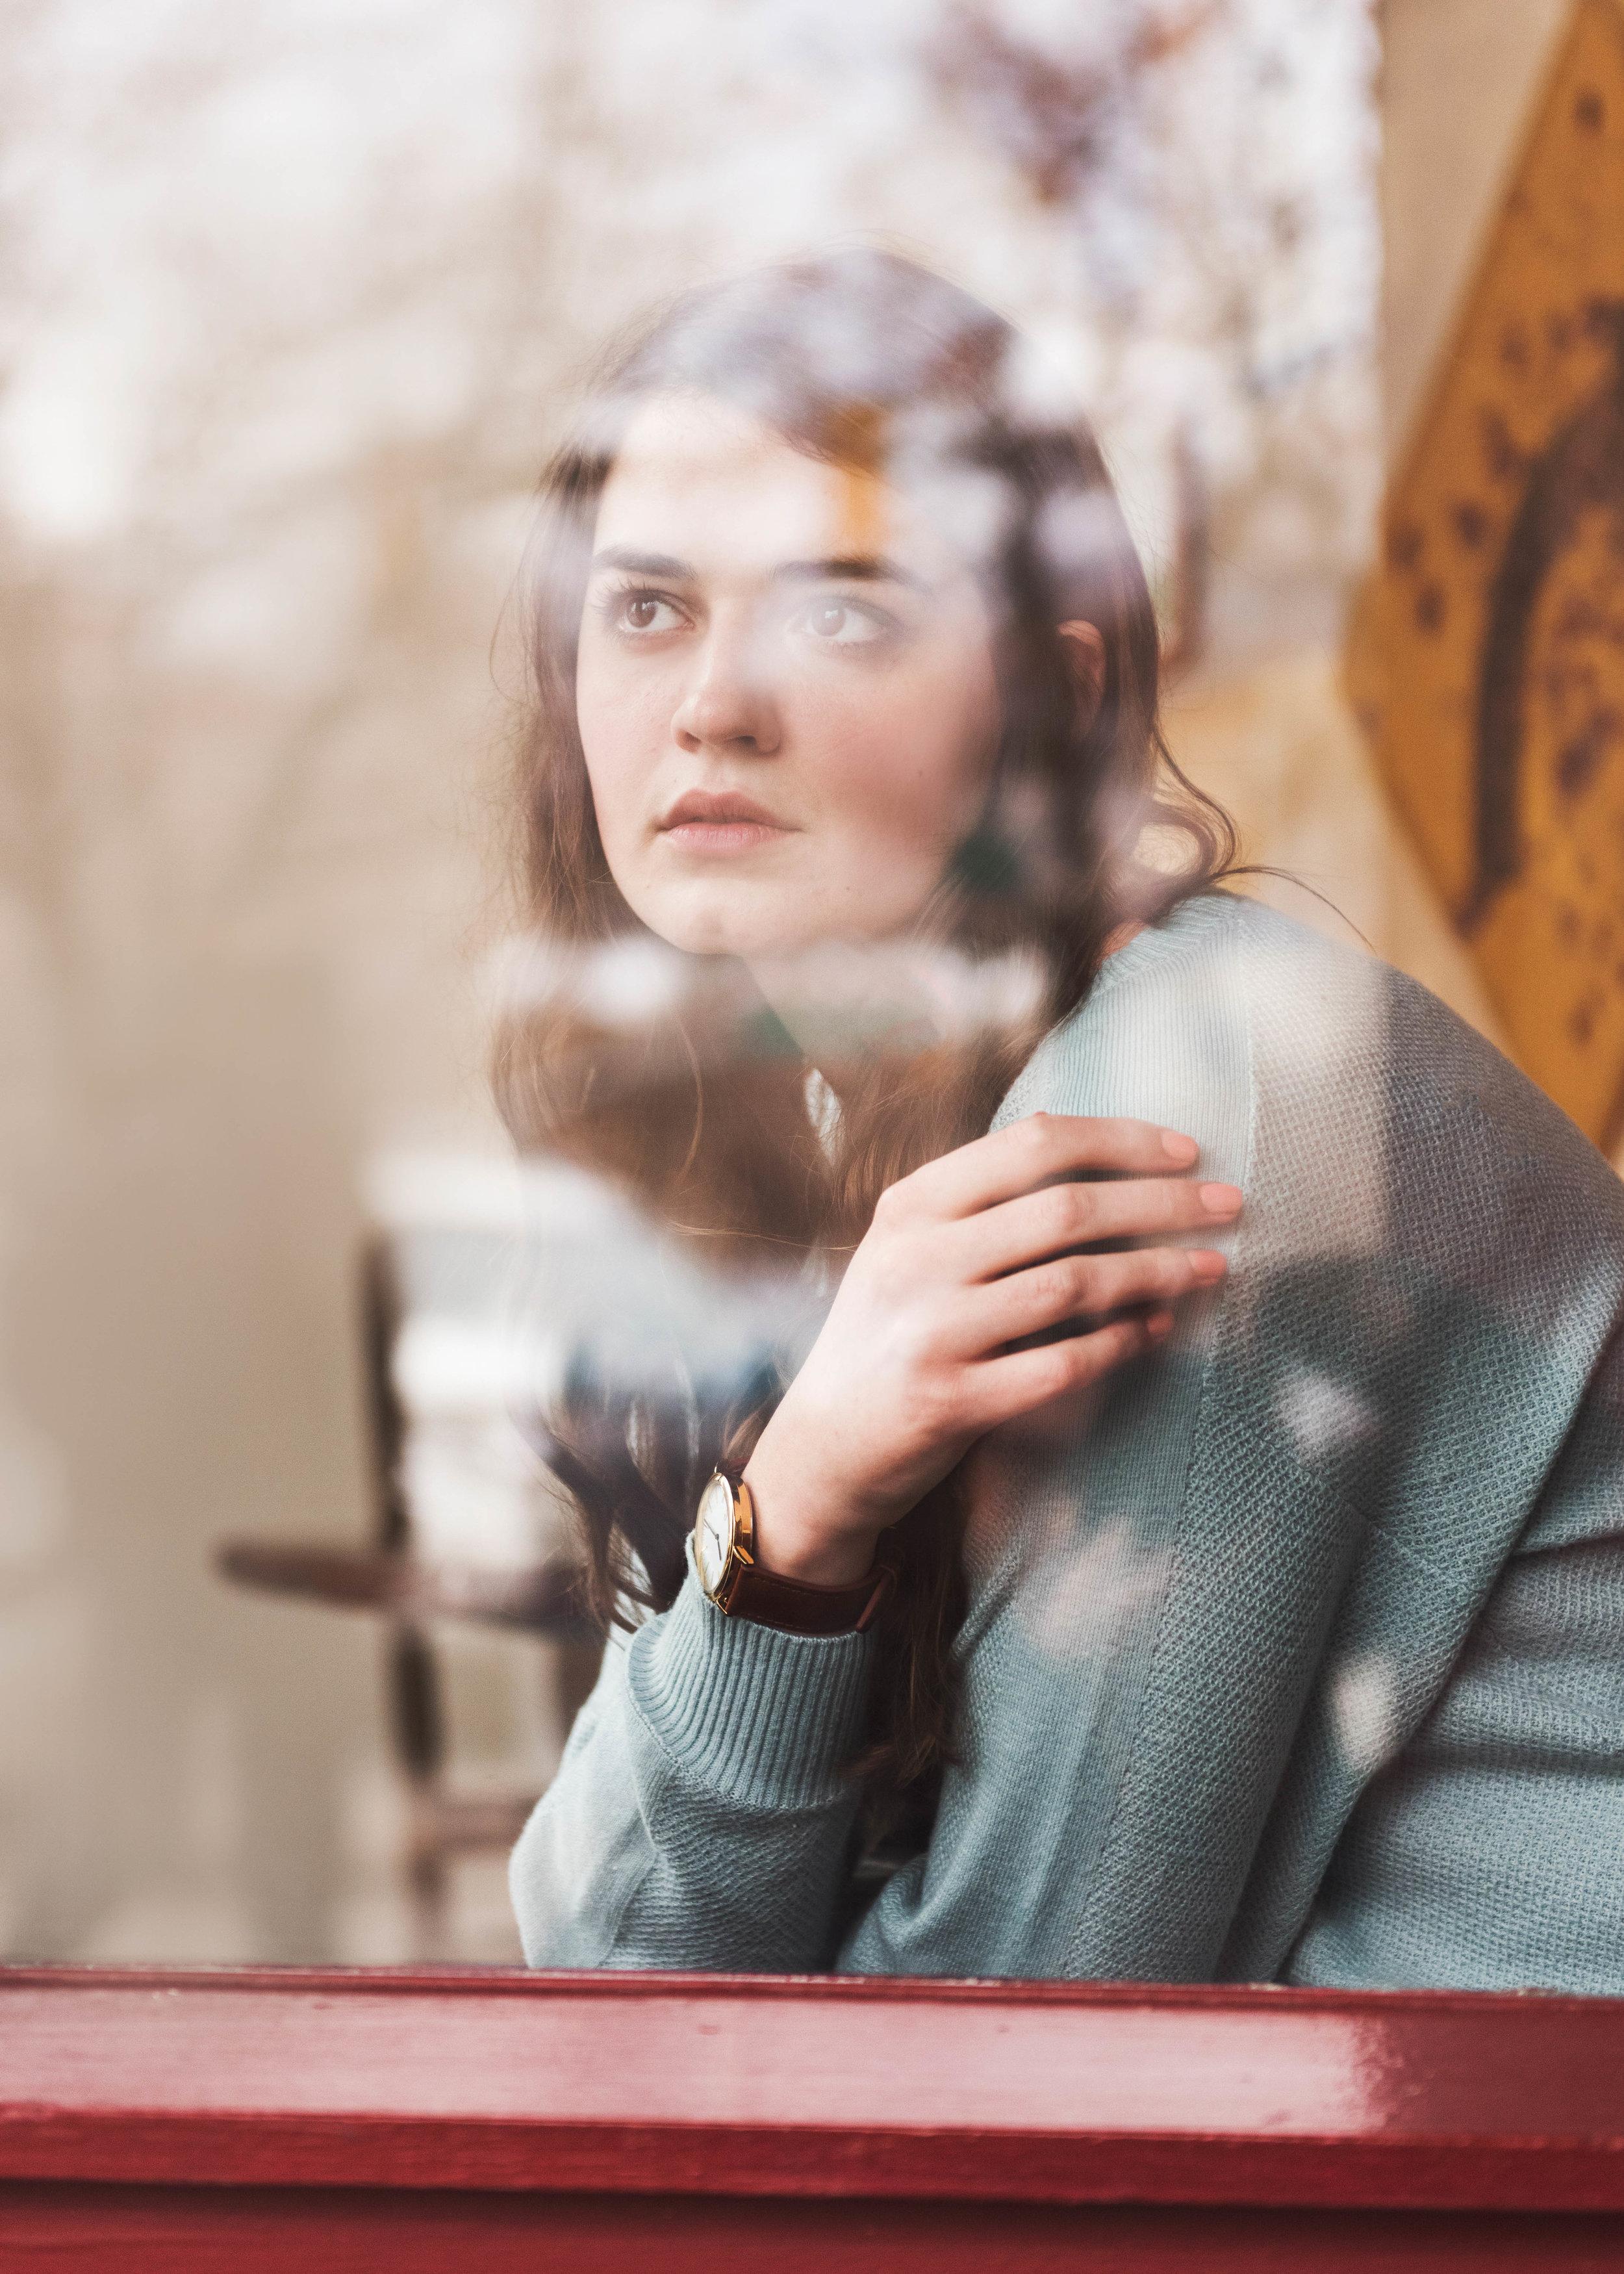 Image captured by Jane Merritt